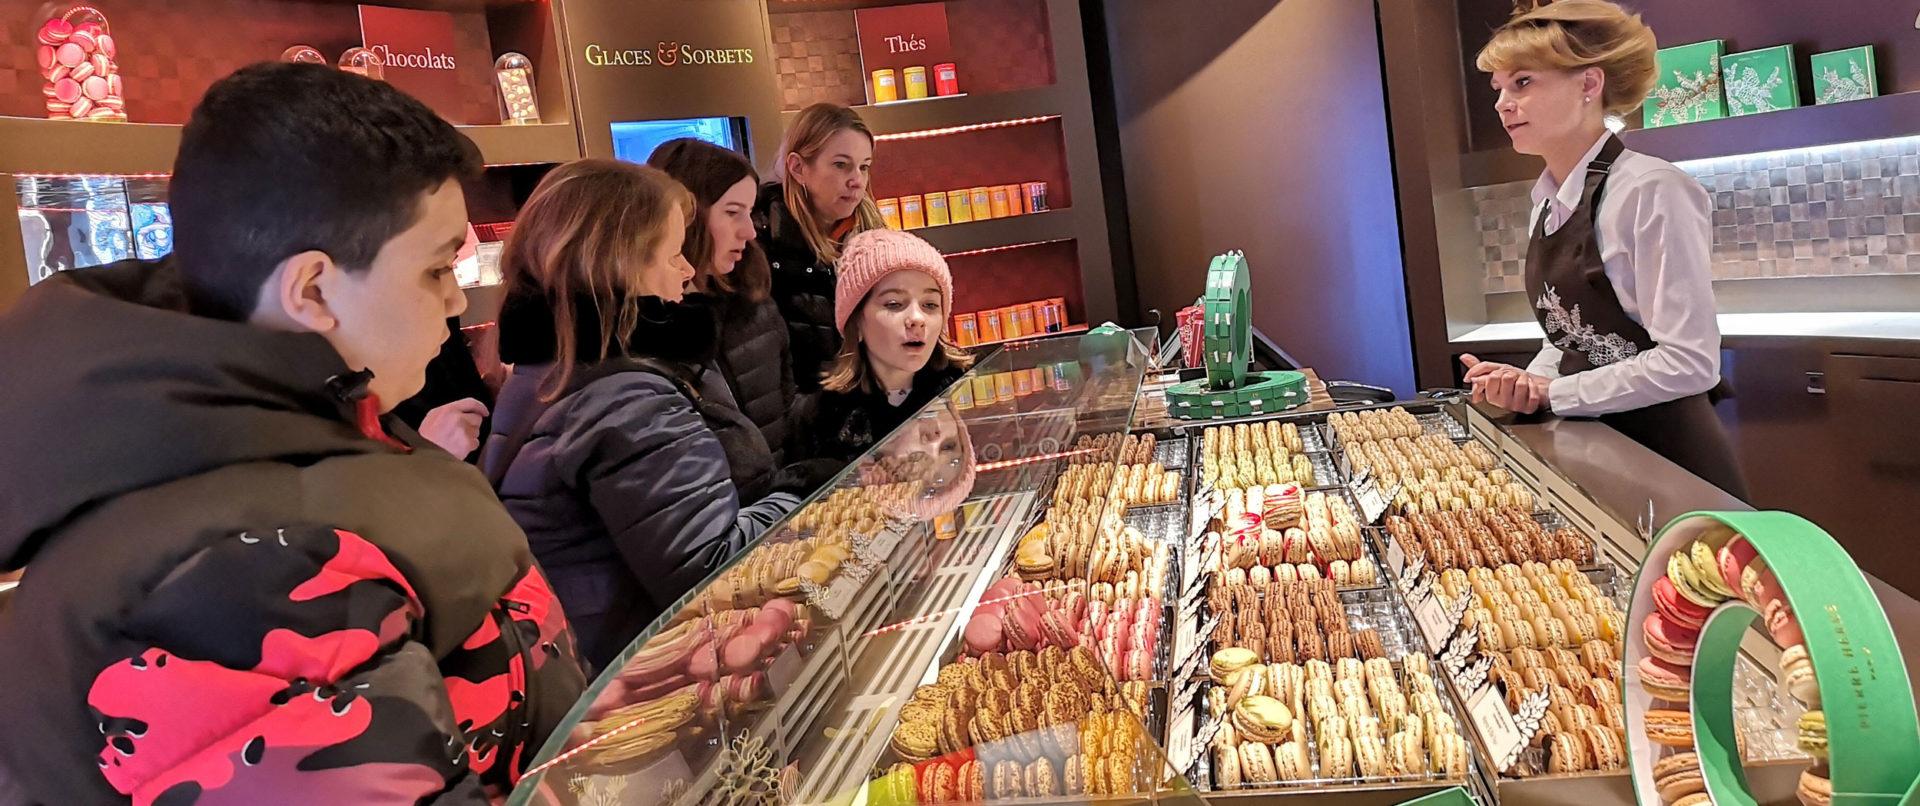 pastry-tour-paris-marais-family-experience-herme